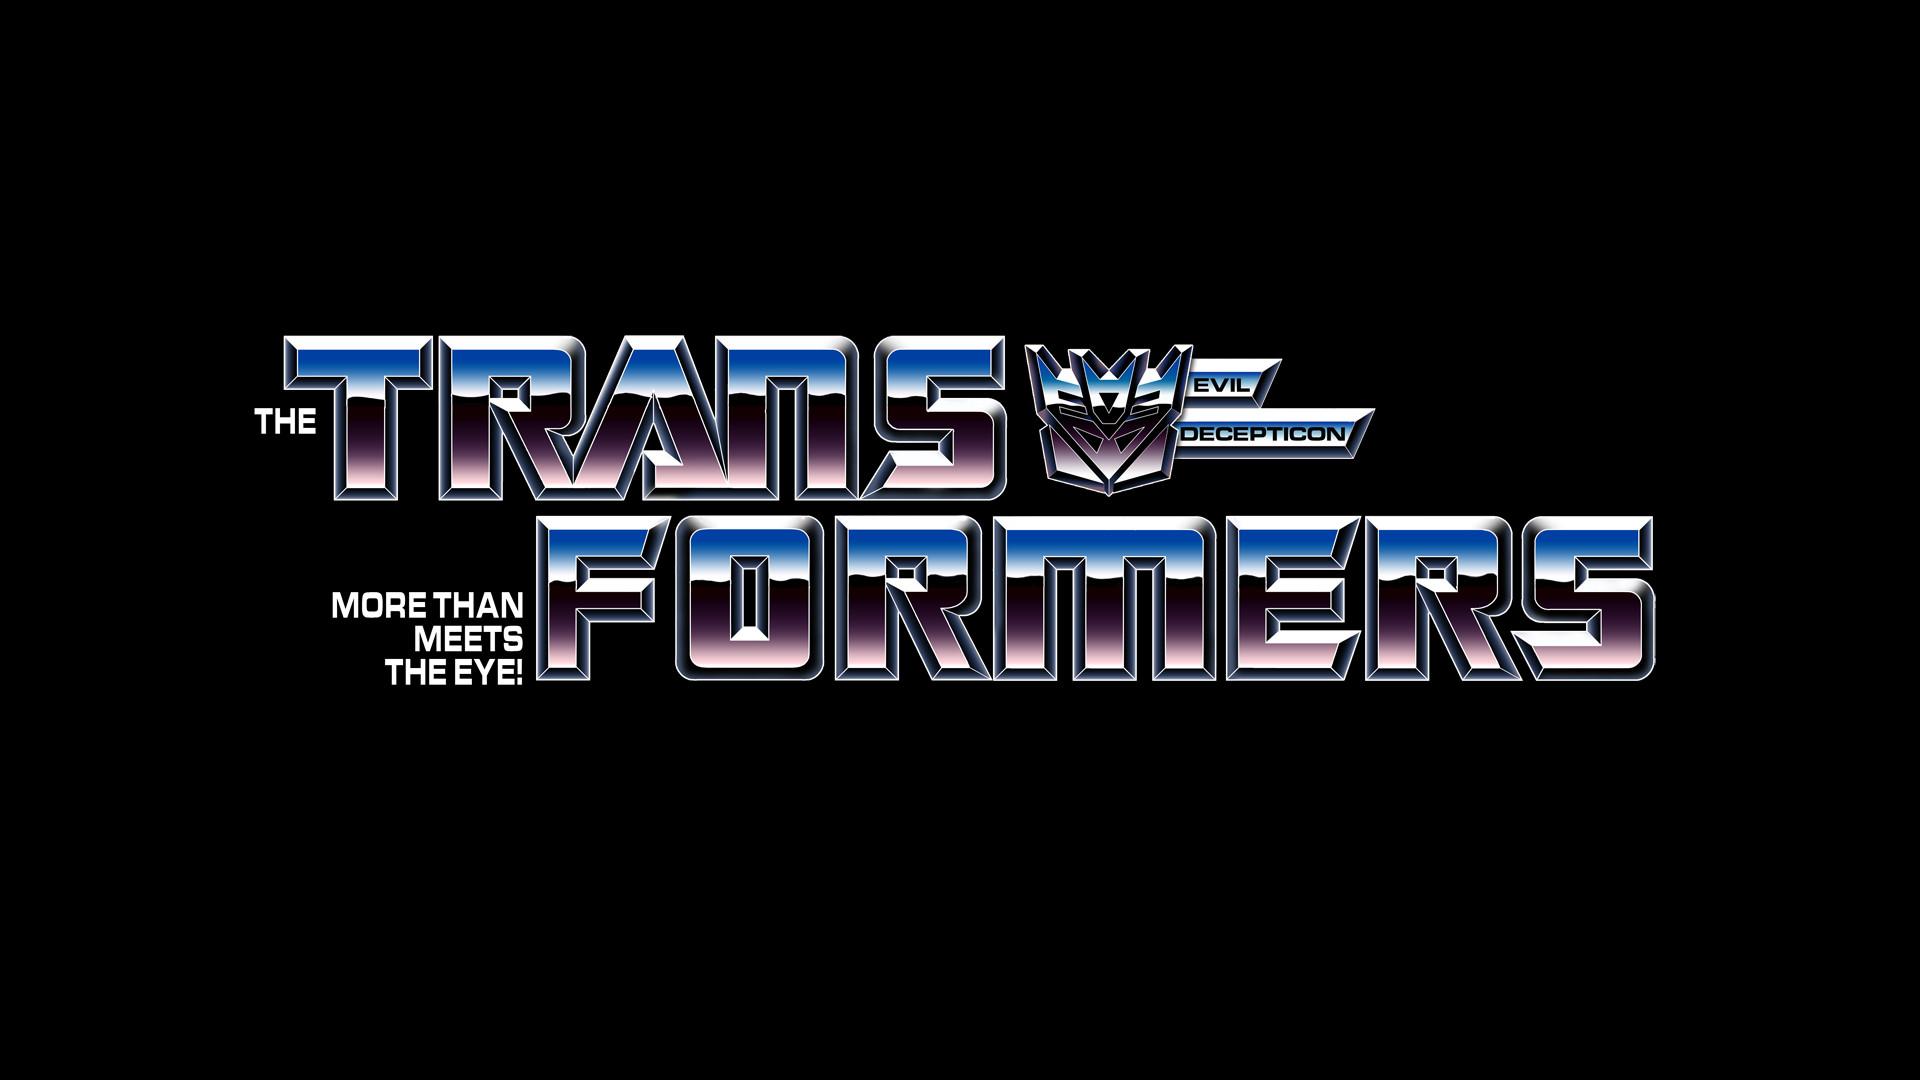 Full HD 1080p Transformers Wallpapers HD, Desktop Backgrounds .